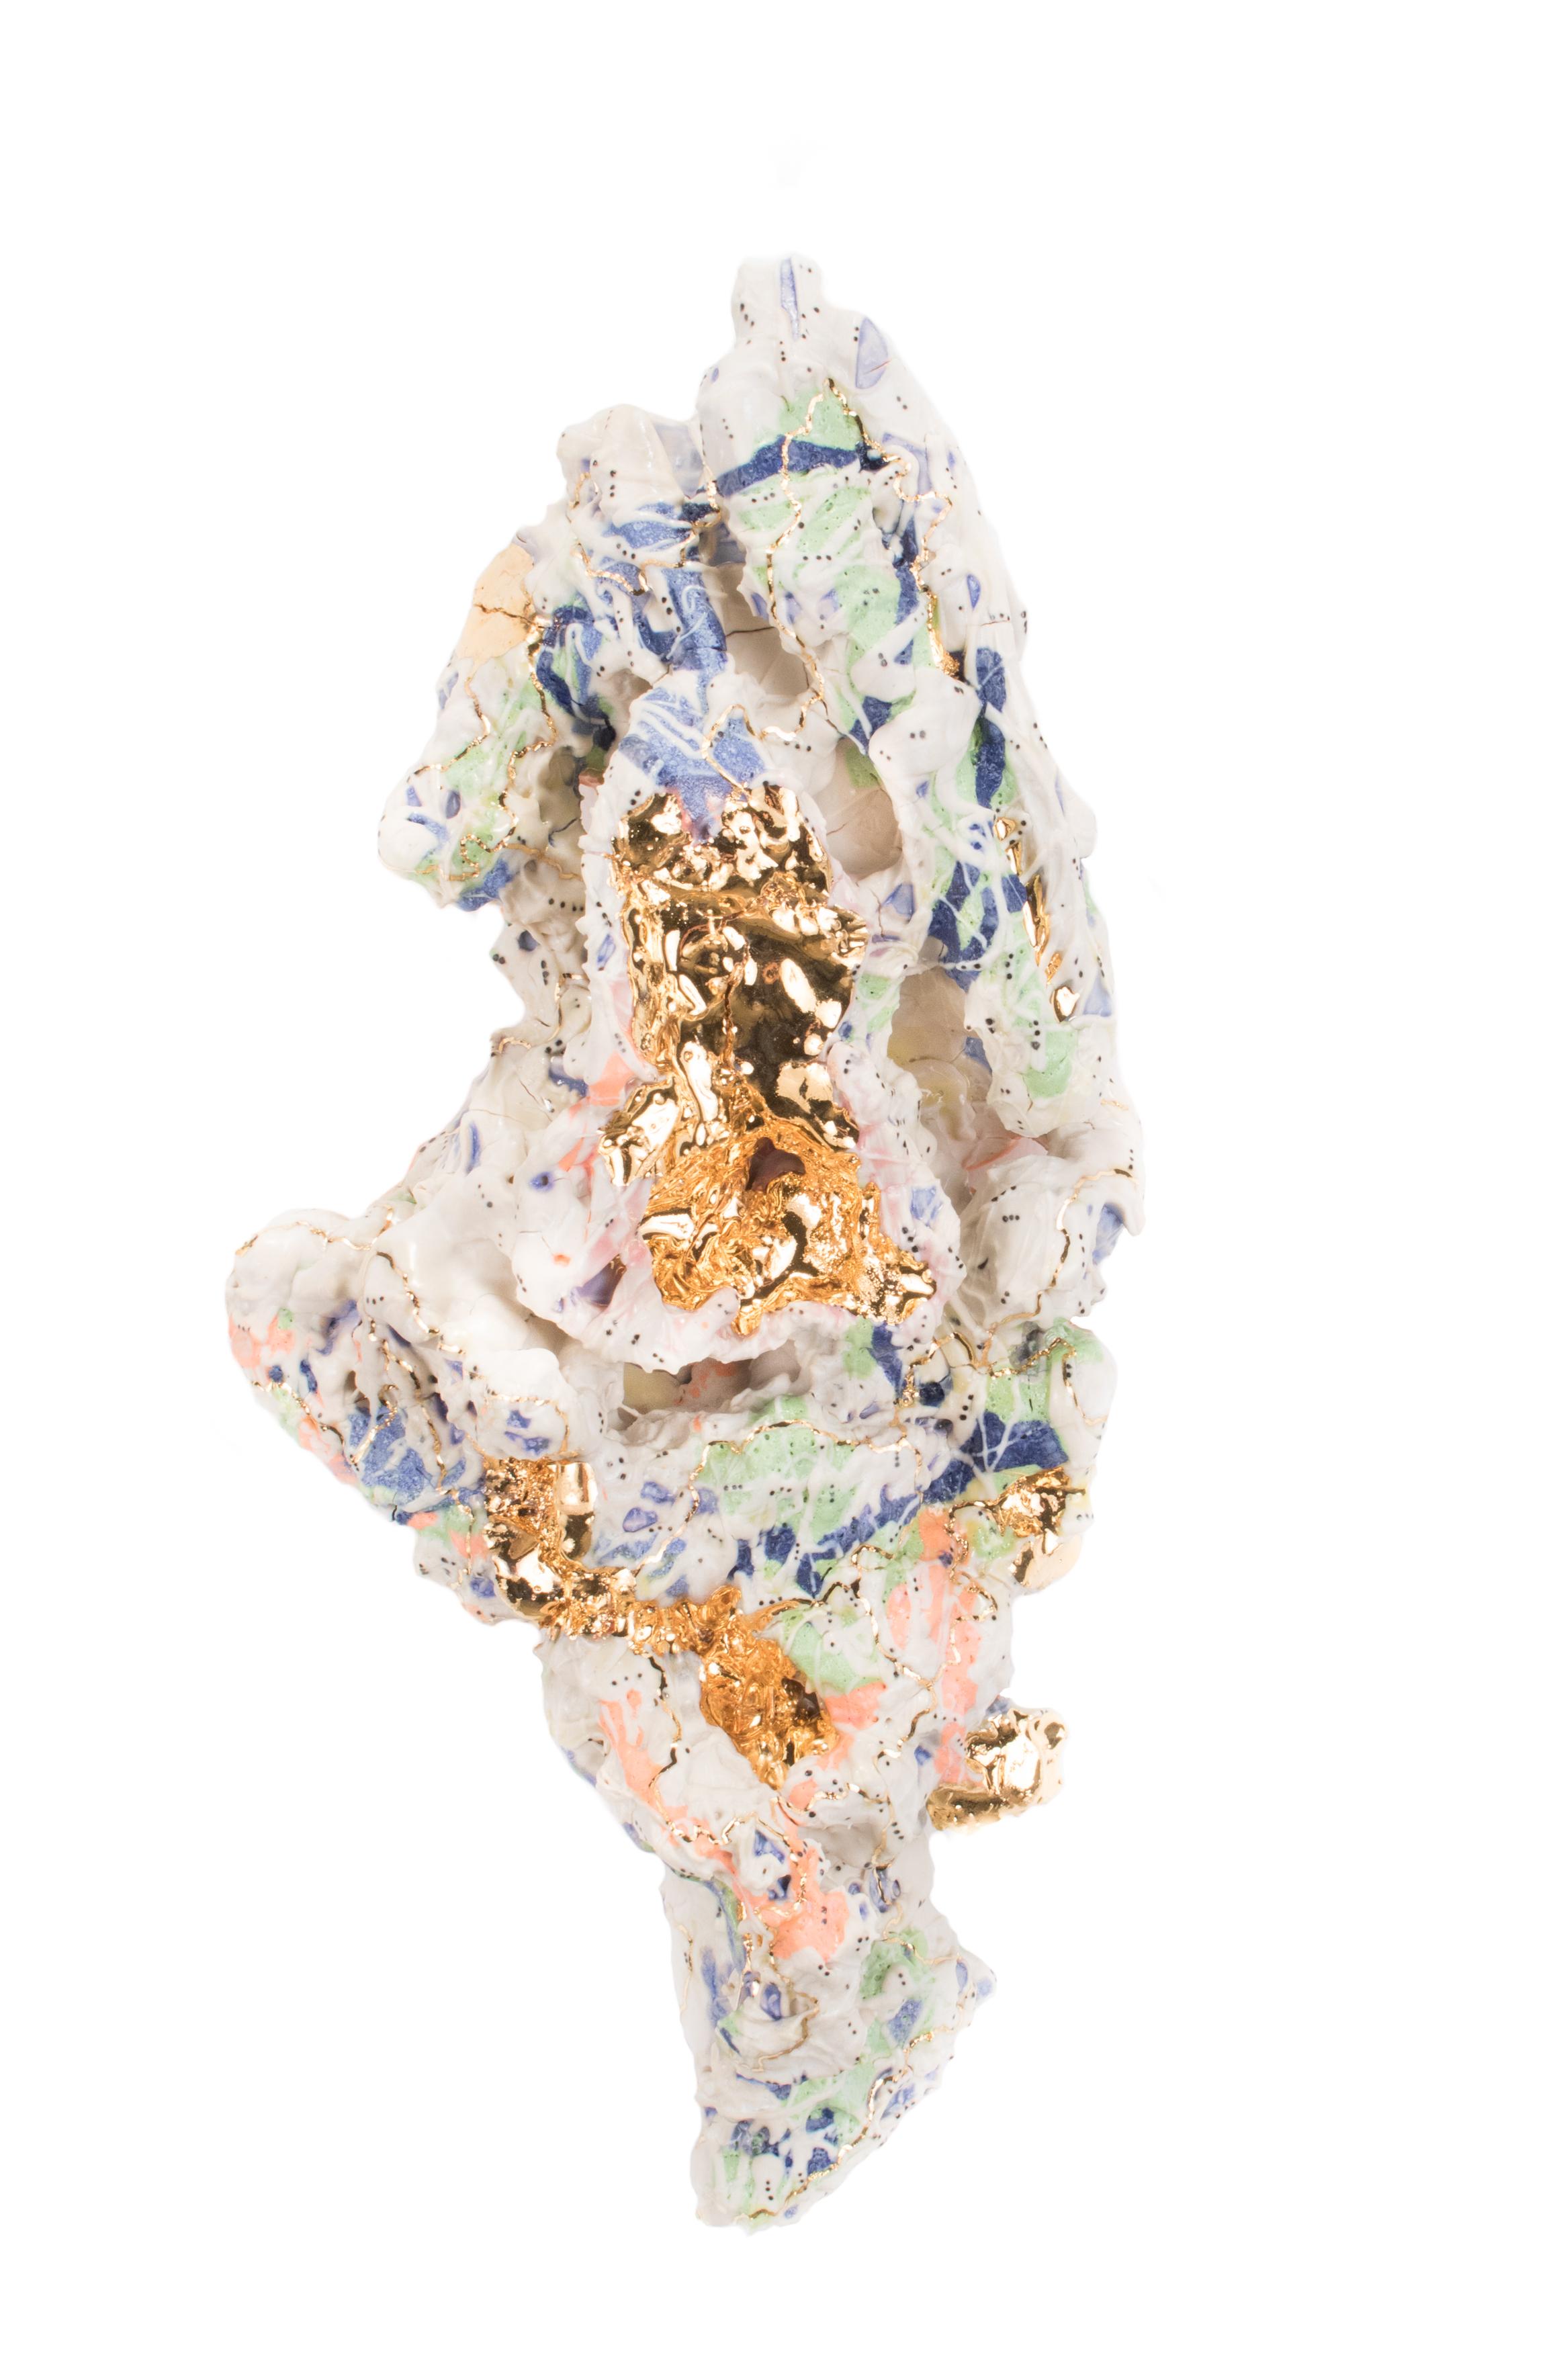 Assemblage 145. 2017  Ceramic, Gold Luster  20.5 x 13 x 40.5 cm